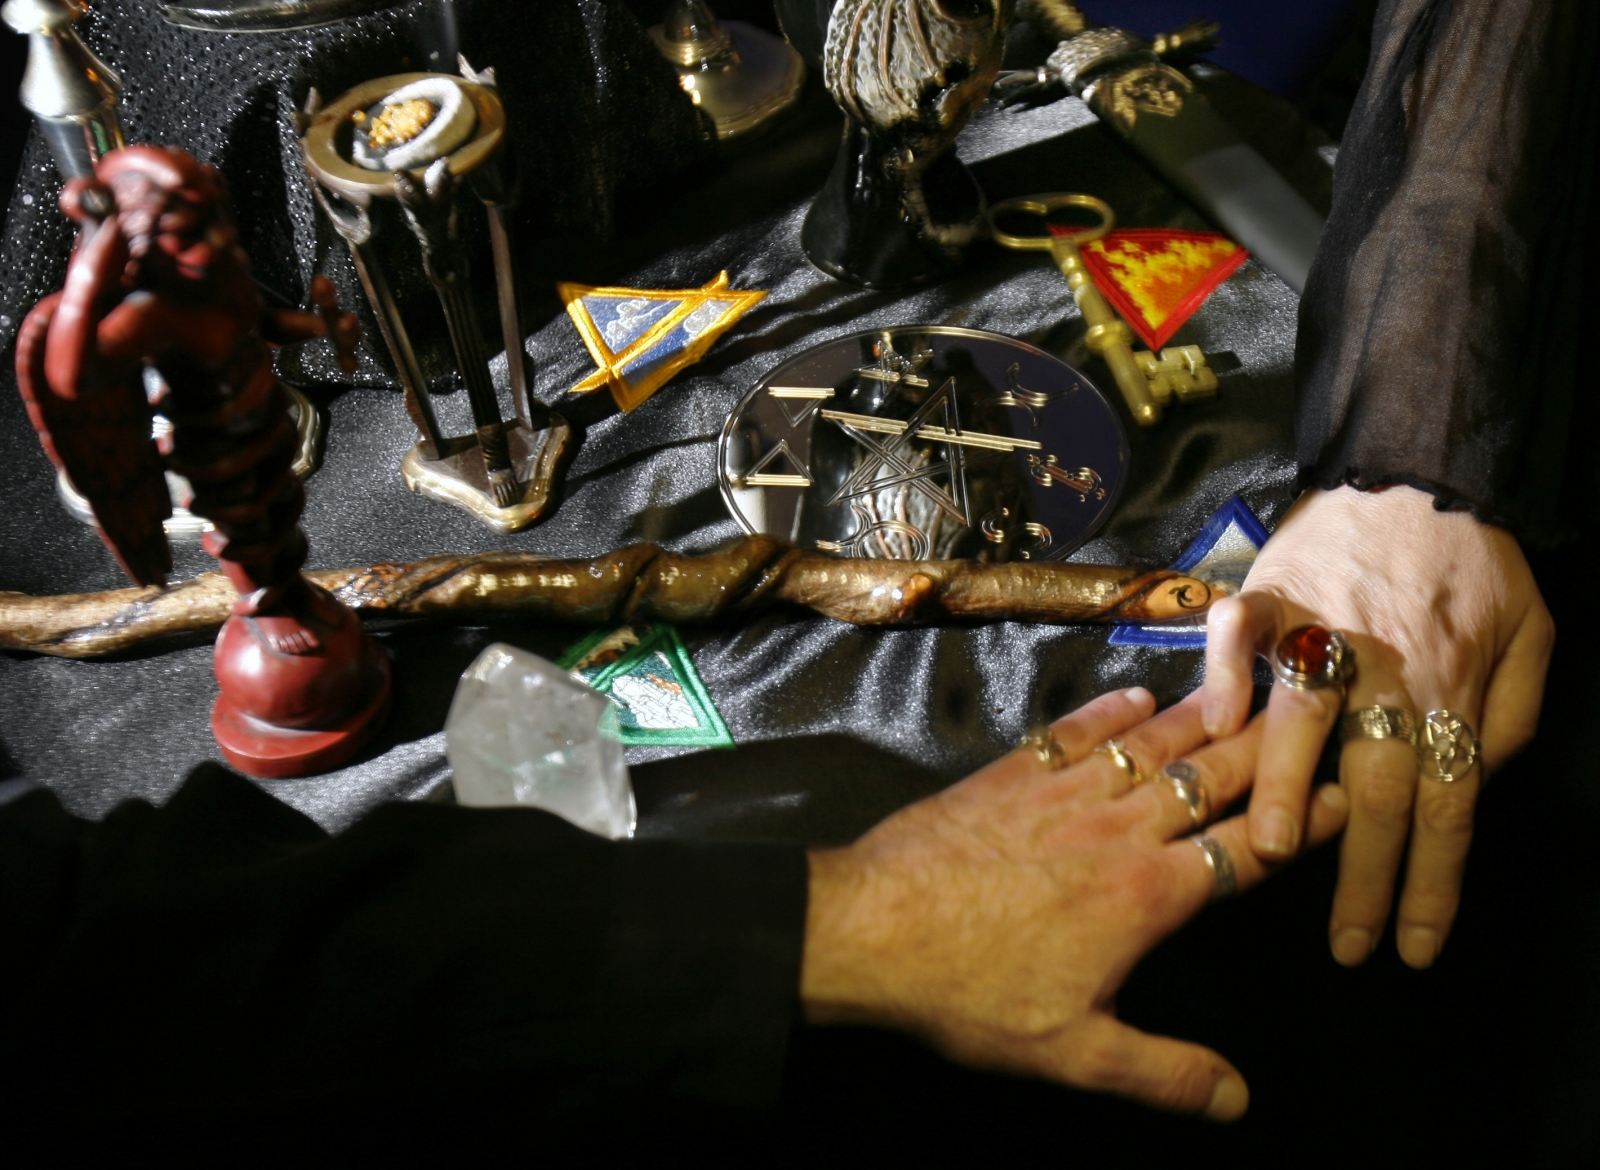 Wiccan ritual killings